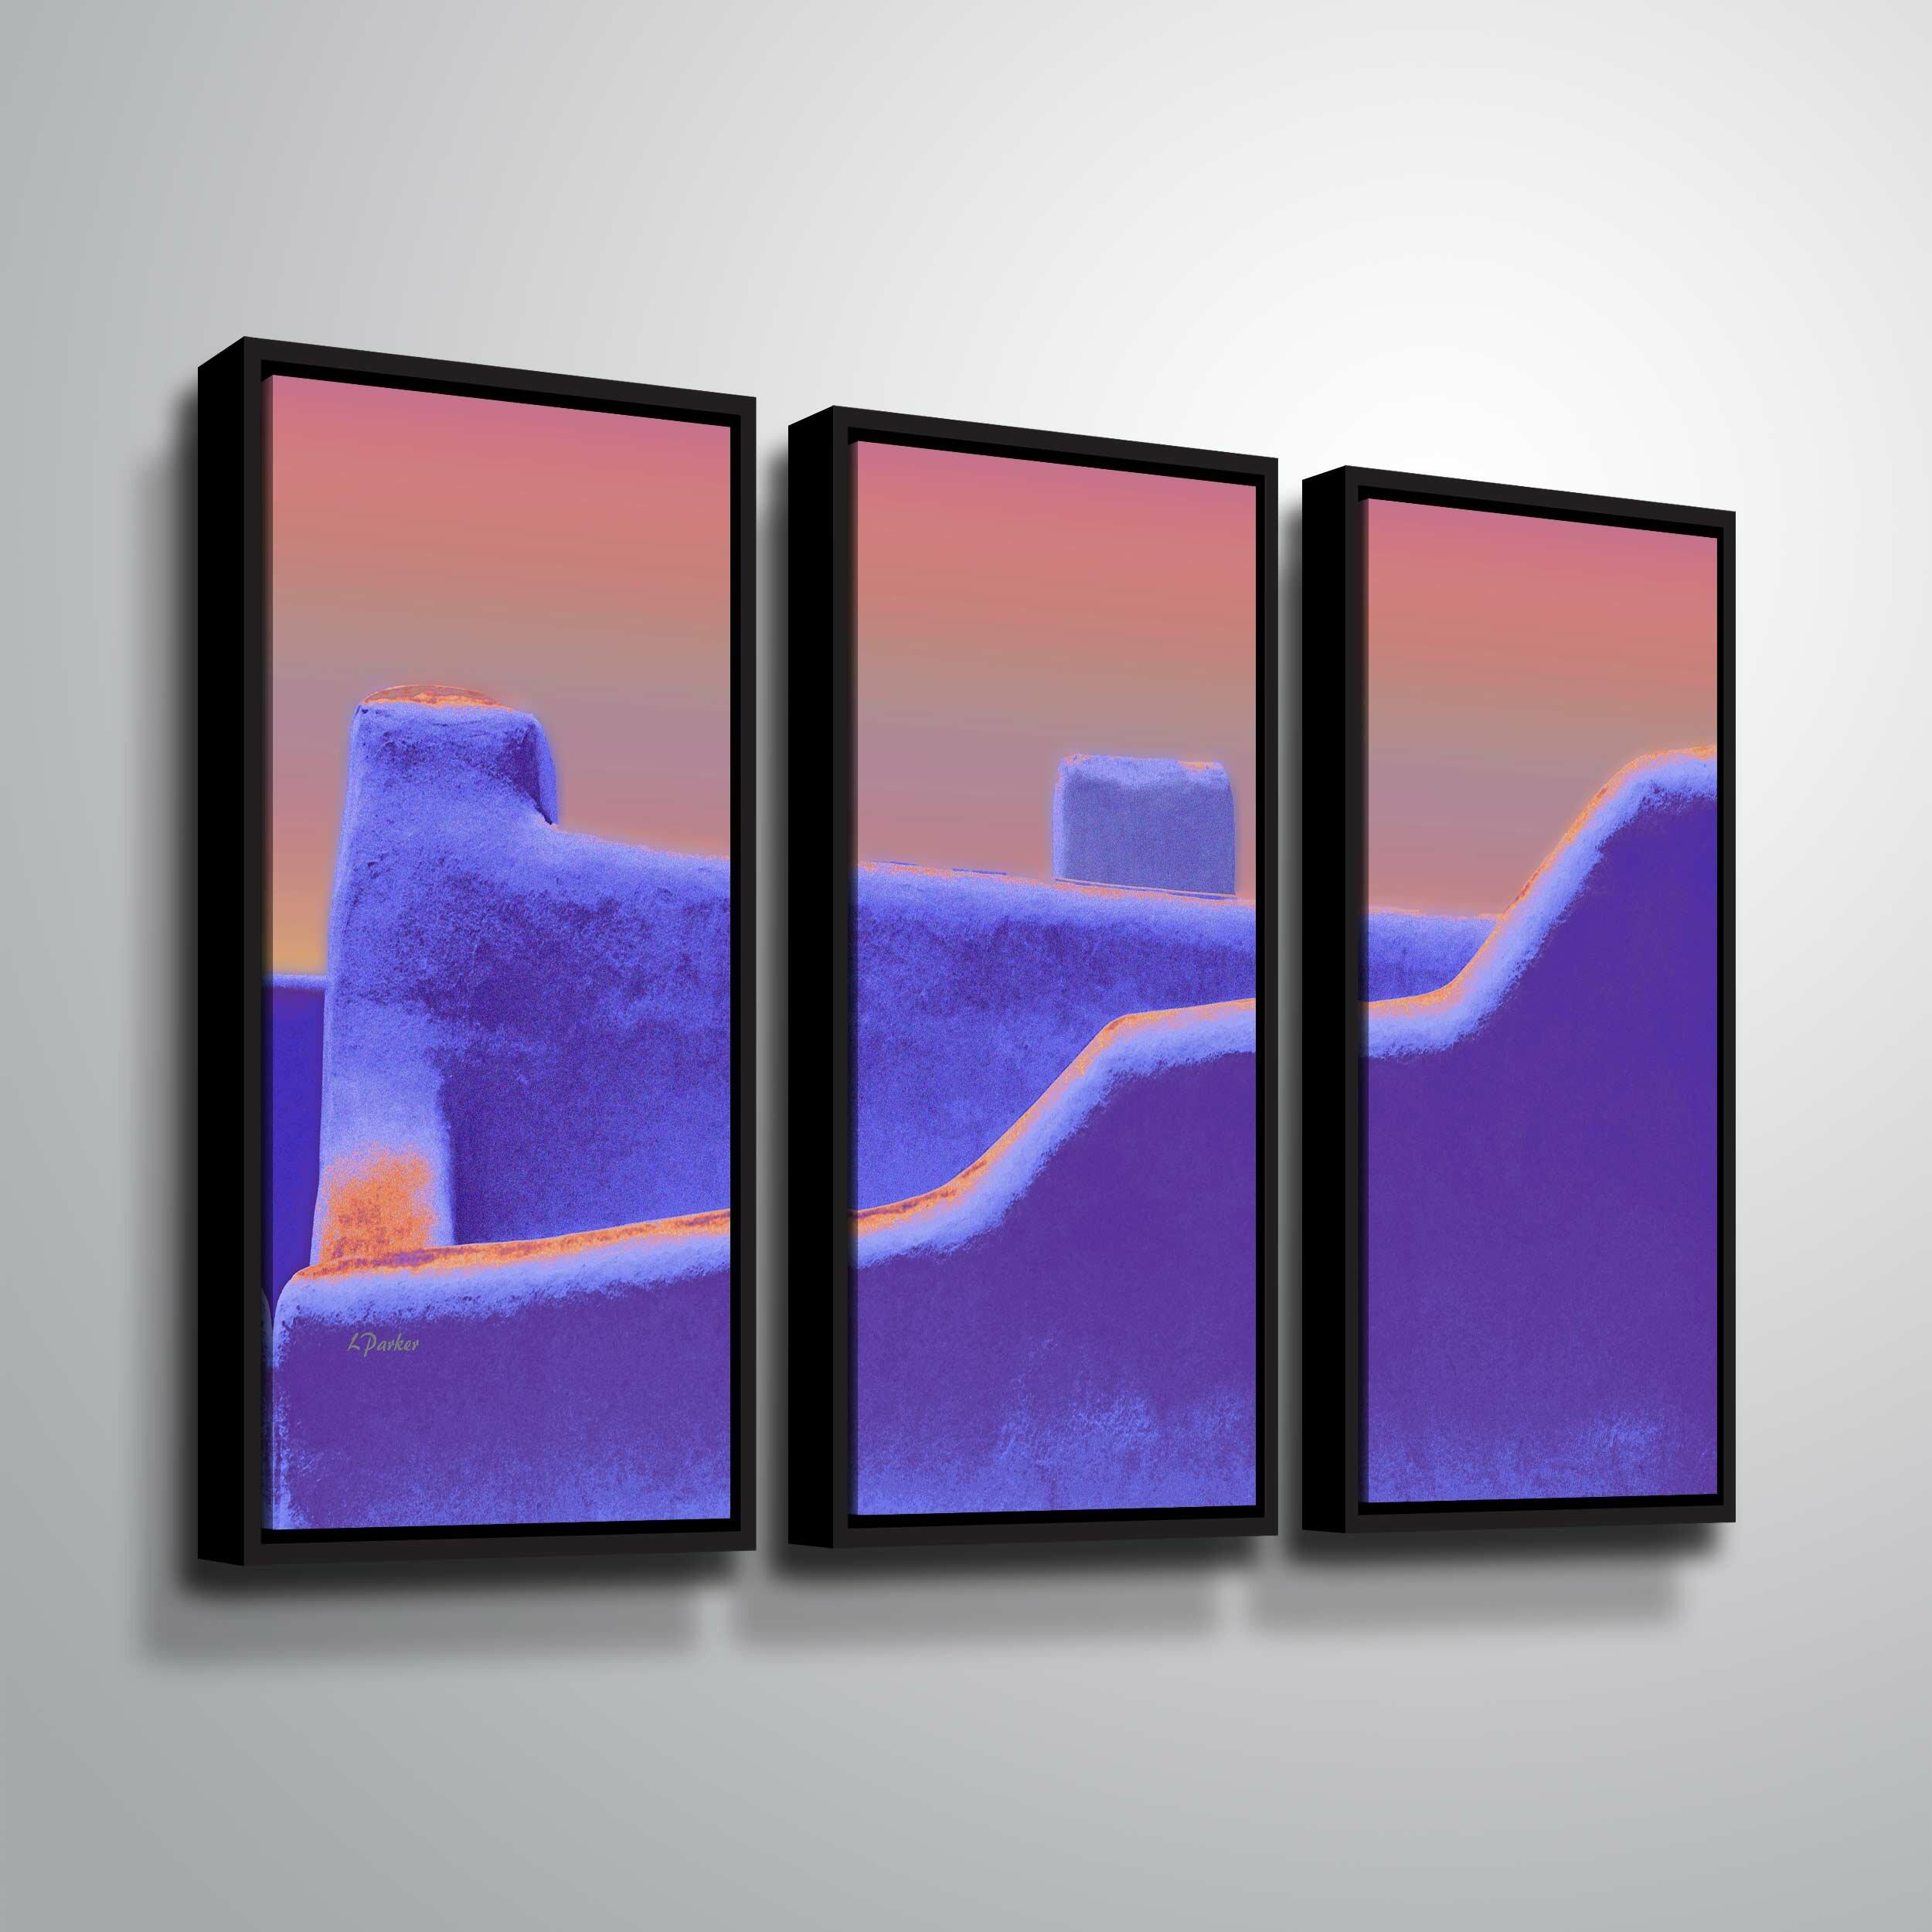 Canvas Santa Fe >> Santa Fe Adobe Ii Graphic Art Print Multi Piece Image On Canvas